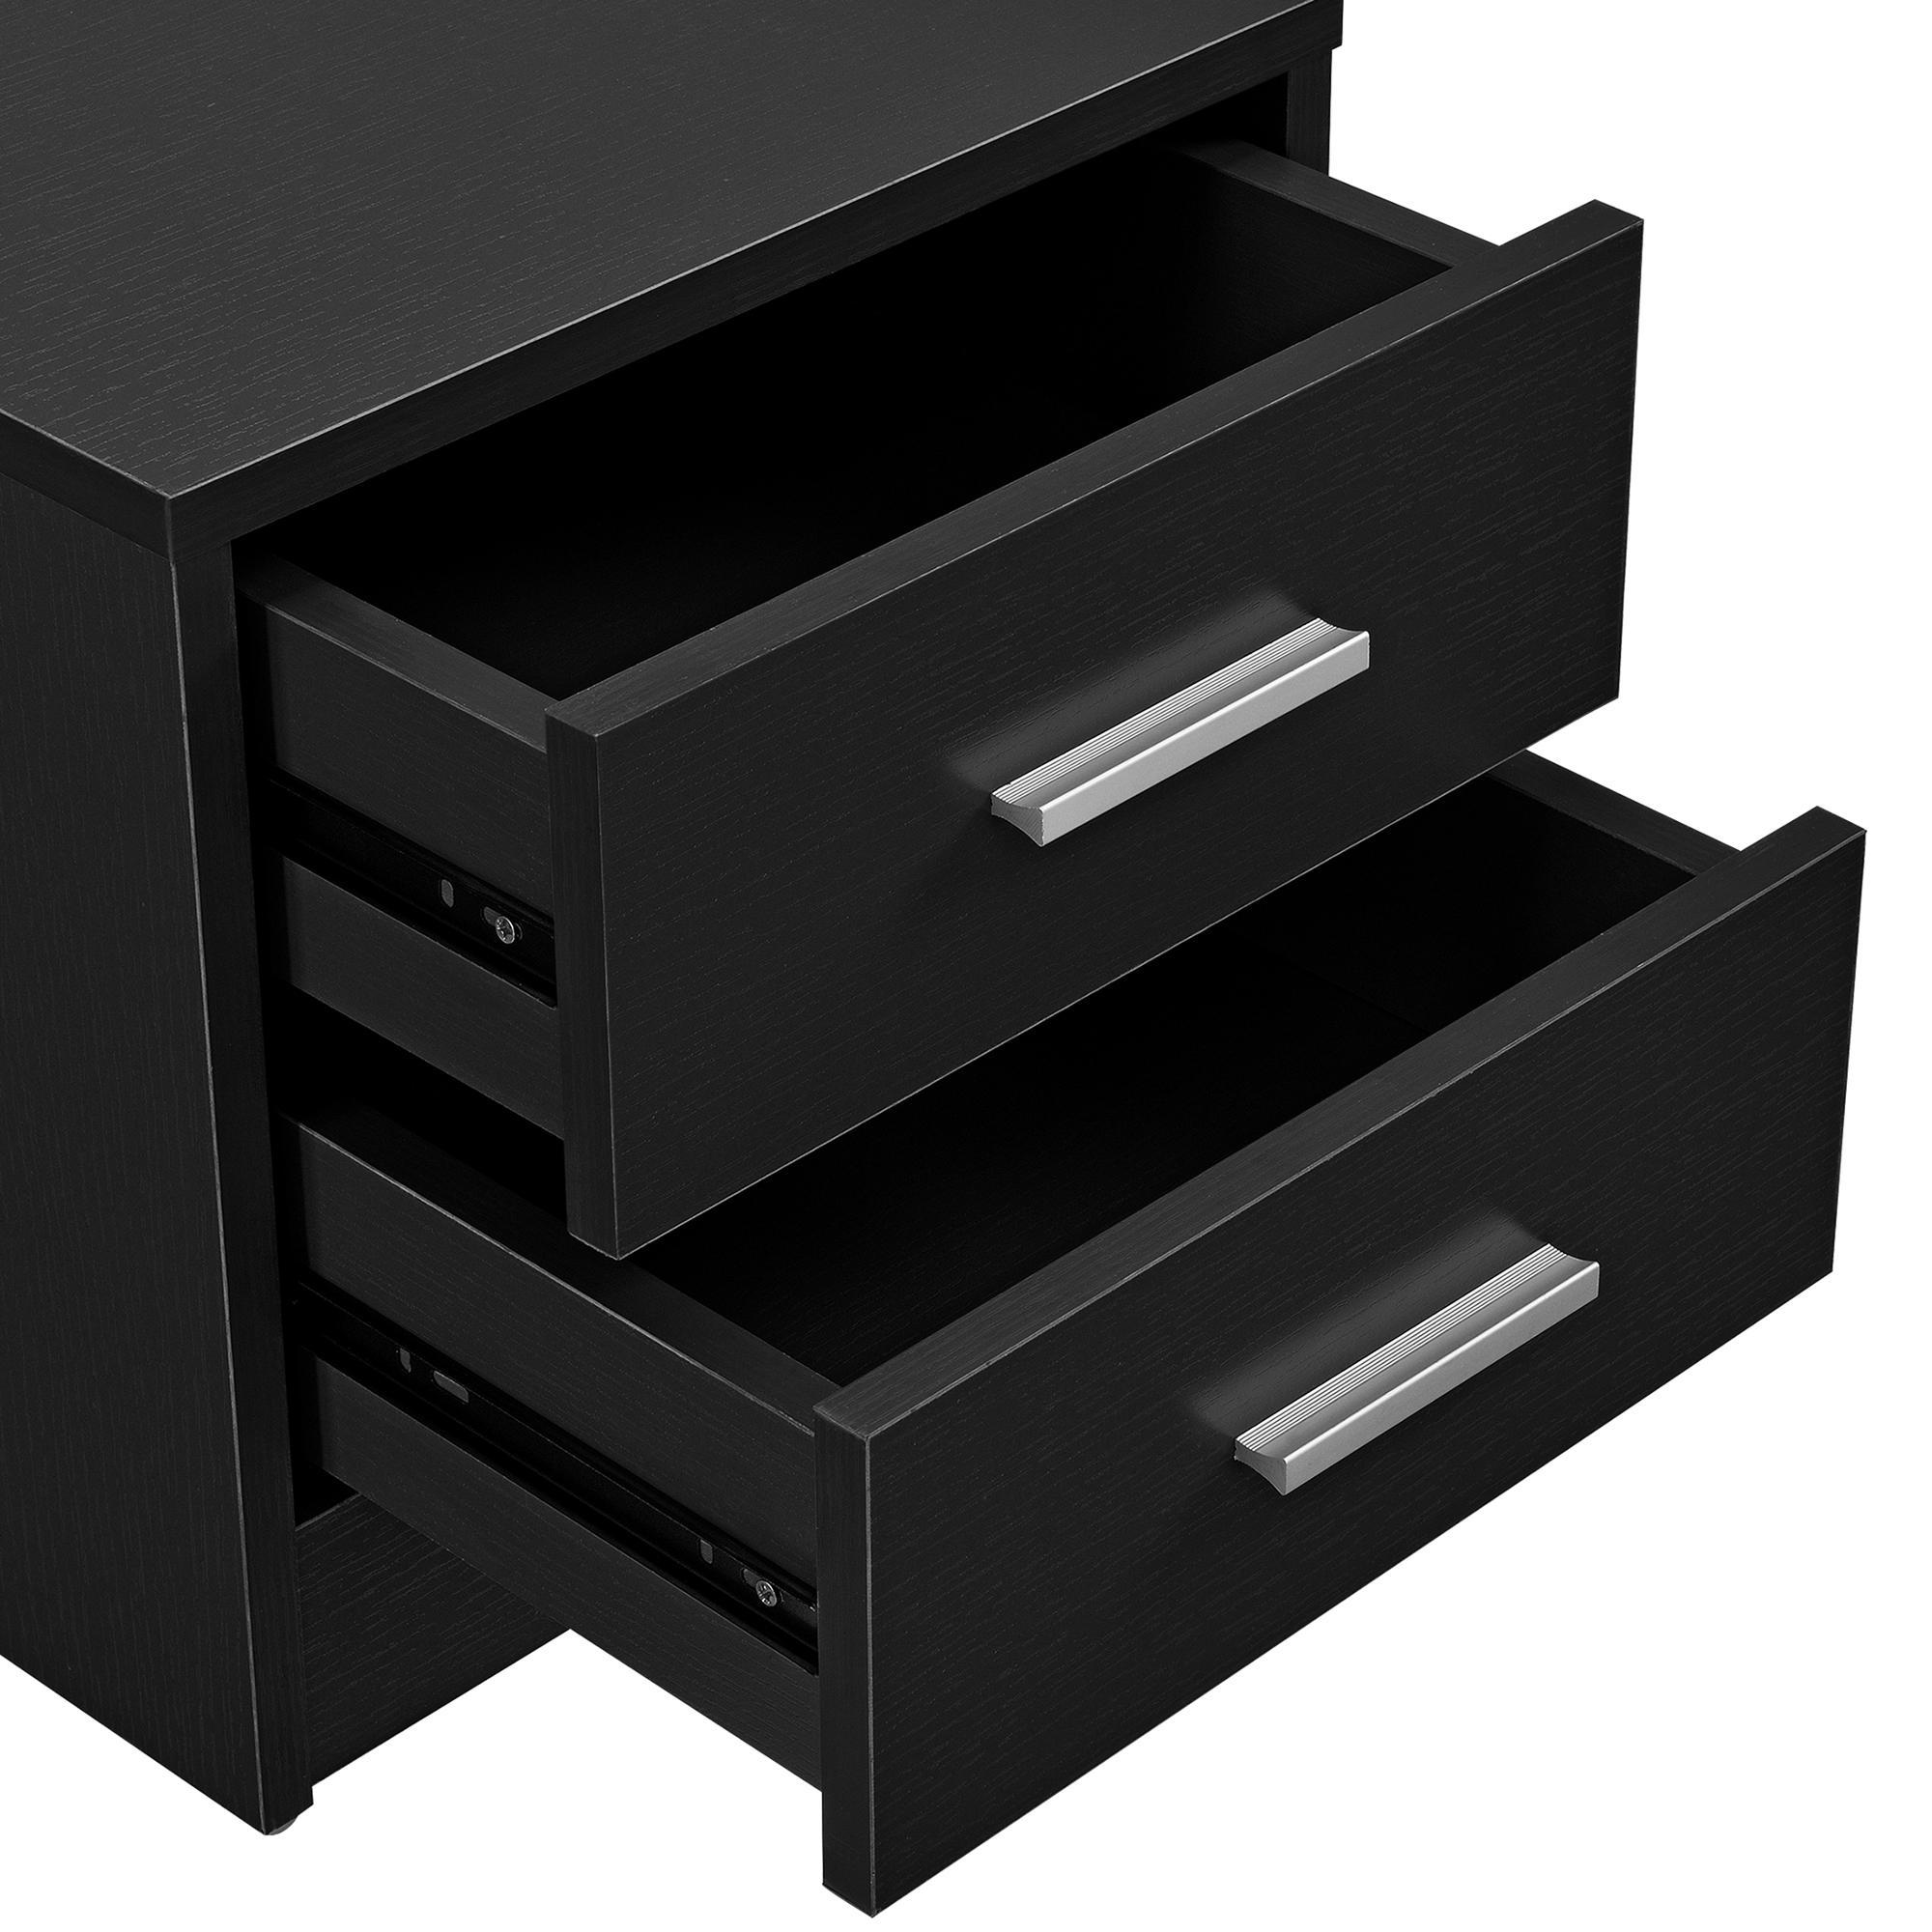 Mesilla de noche mesita con 2 cajones negra mesa auxiliar moderna ebay - Mesilla de noche moderna ...